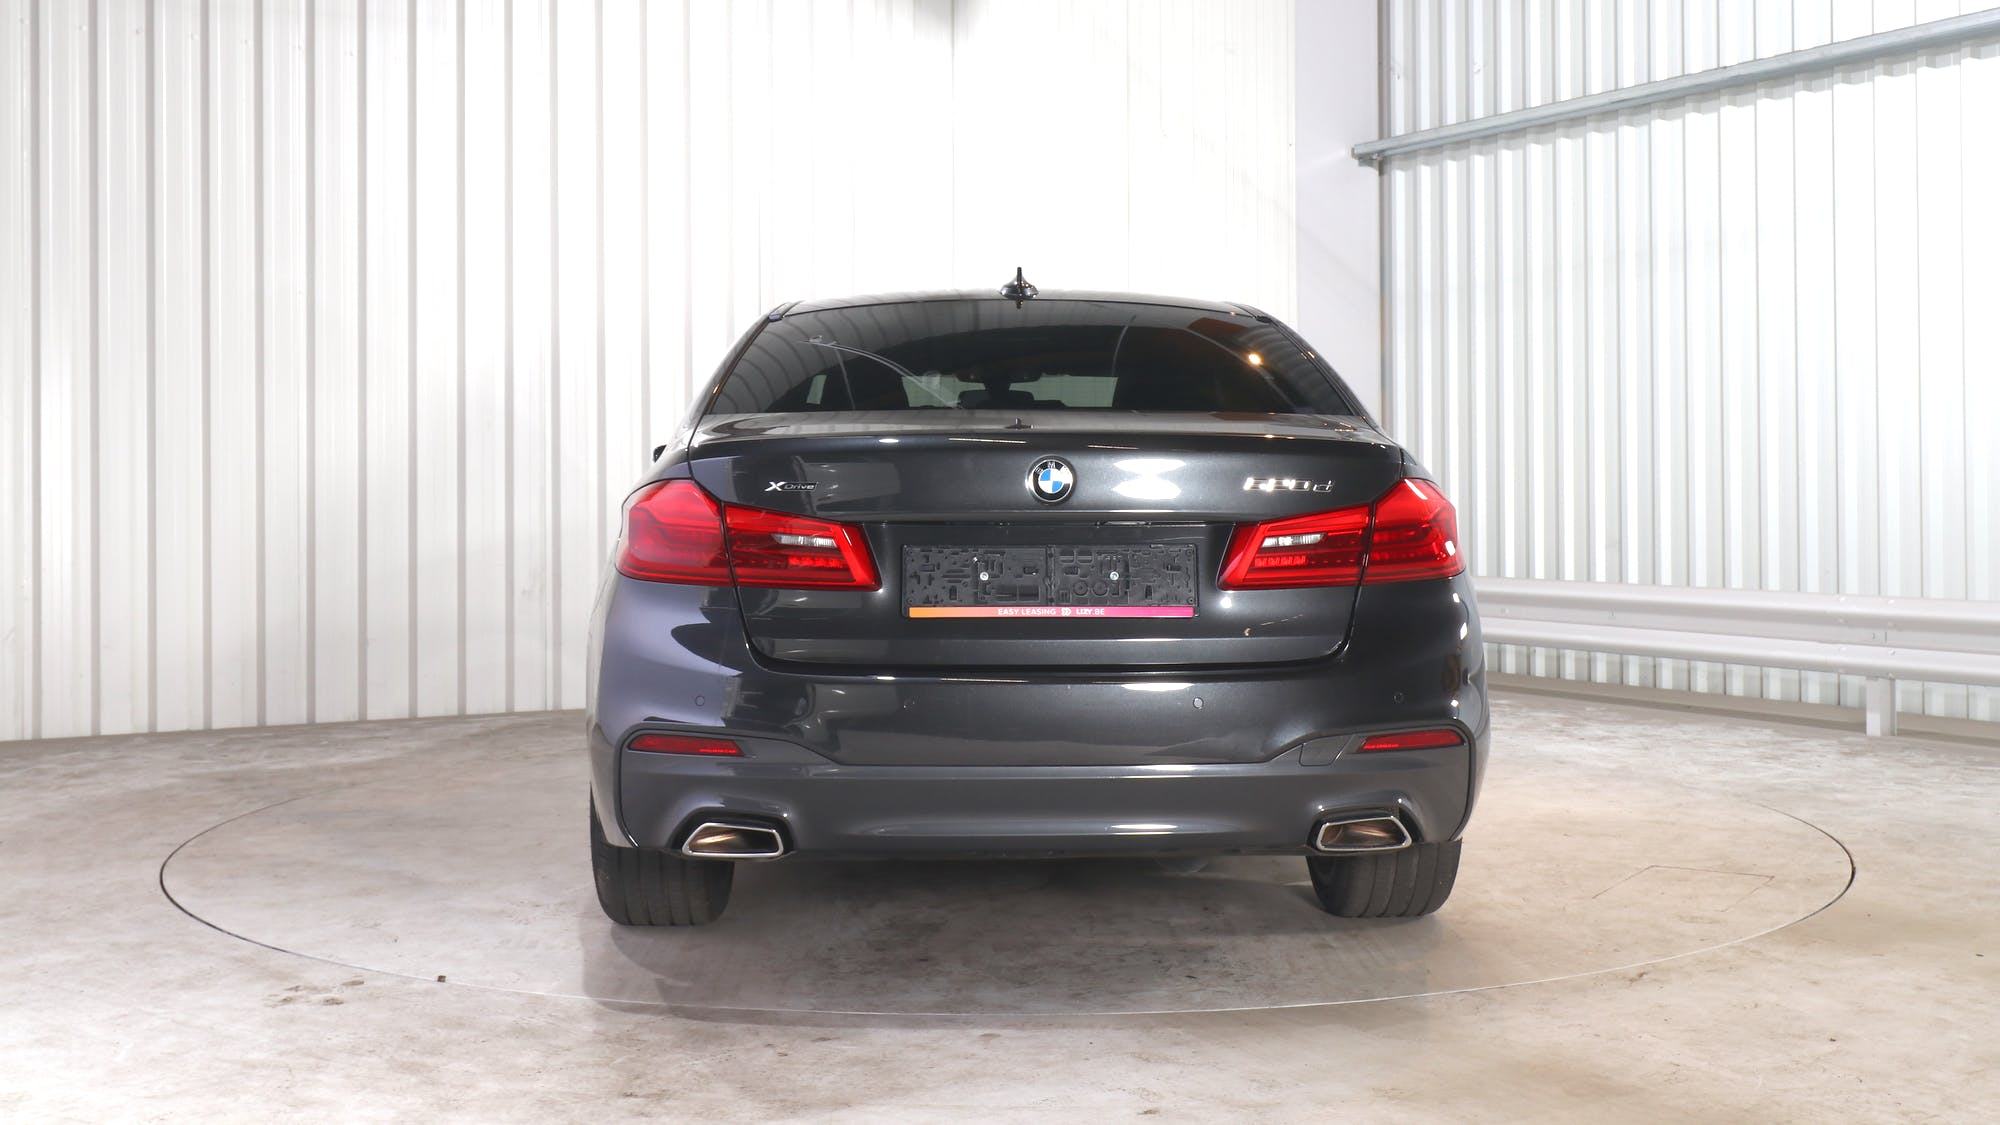 BMW 5 (G30) leasing exterior 5